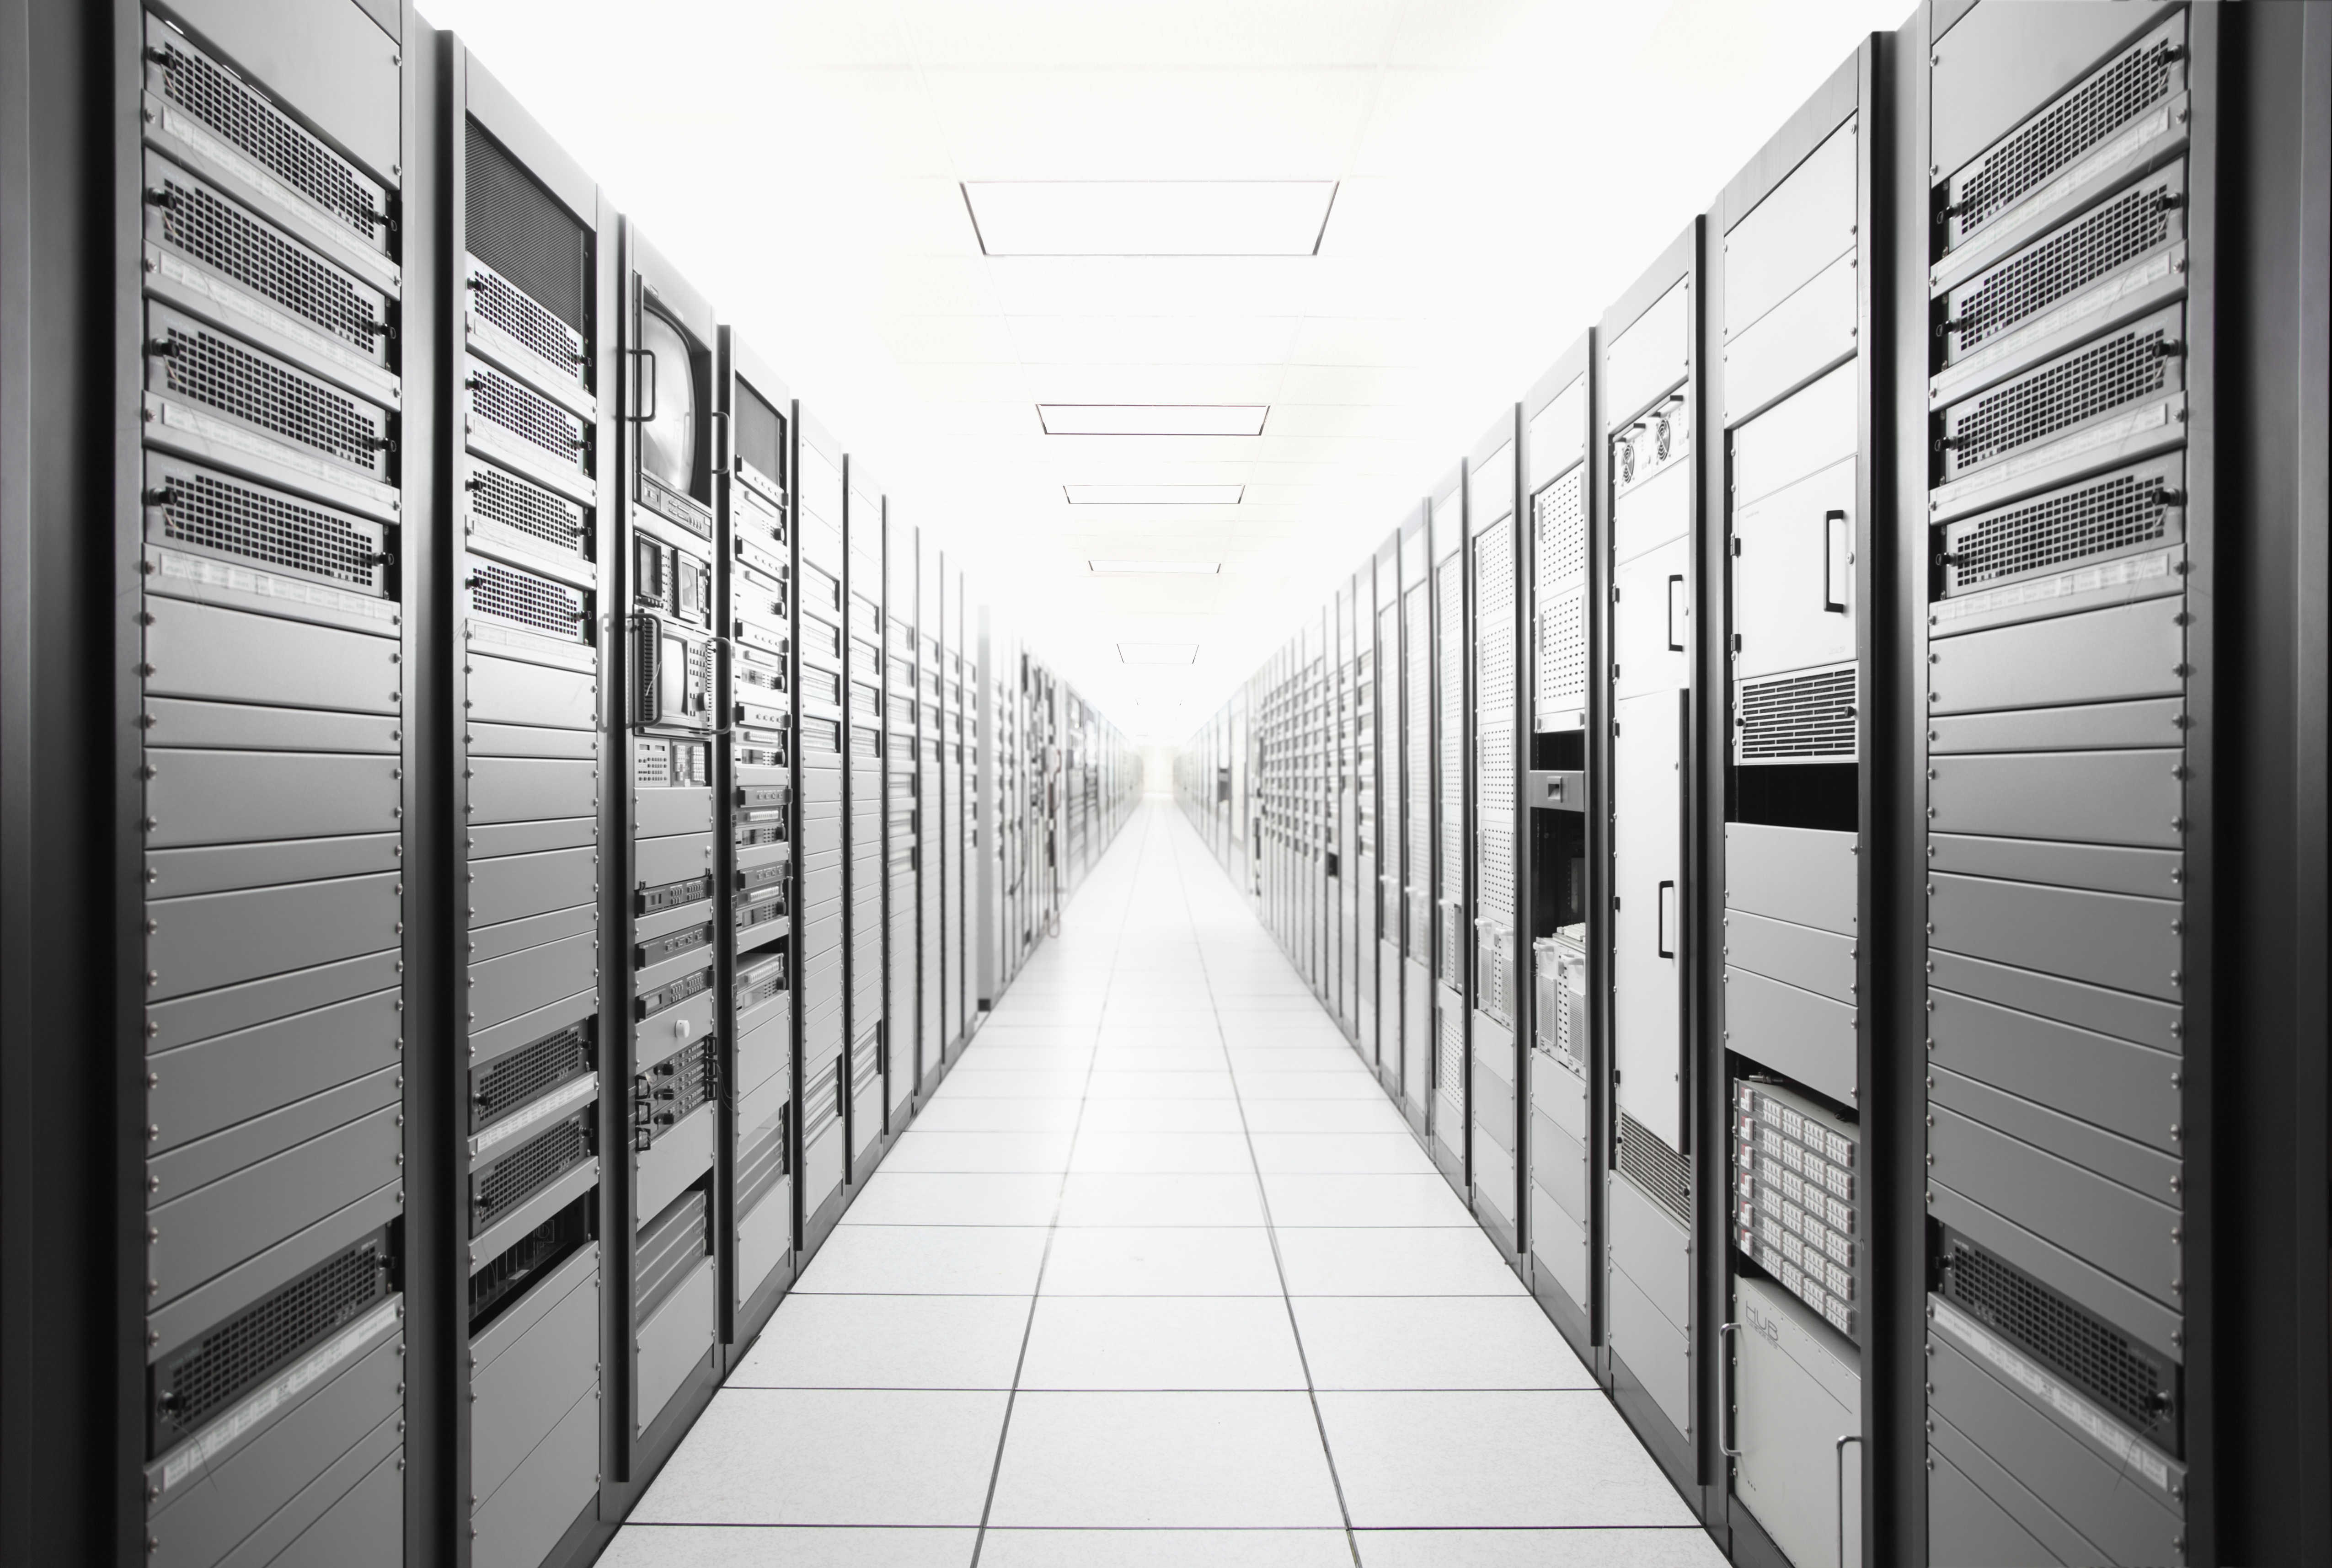 Room of computer servers